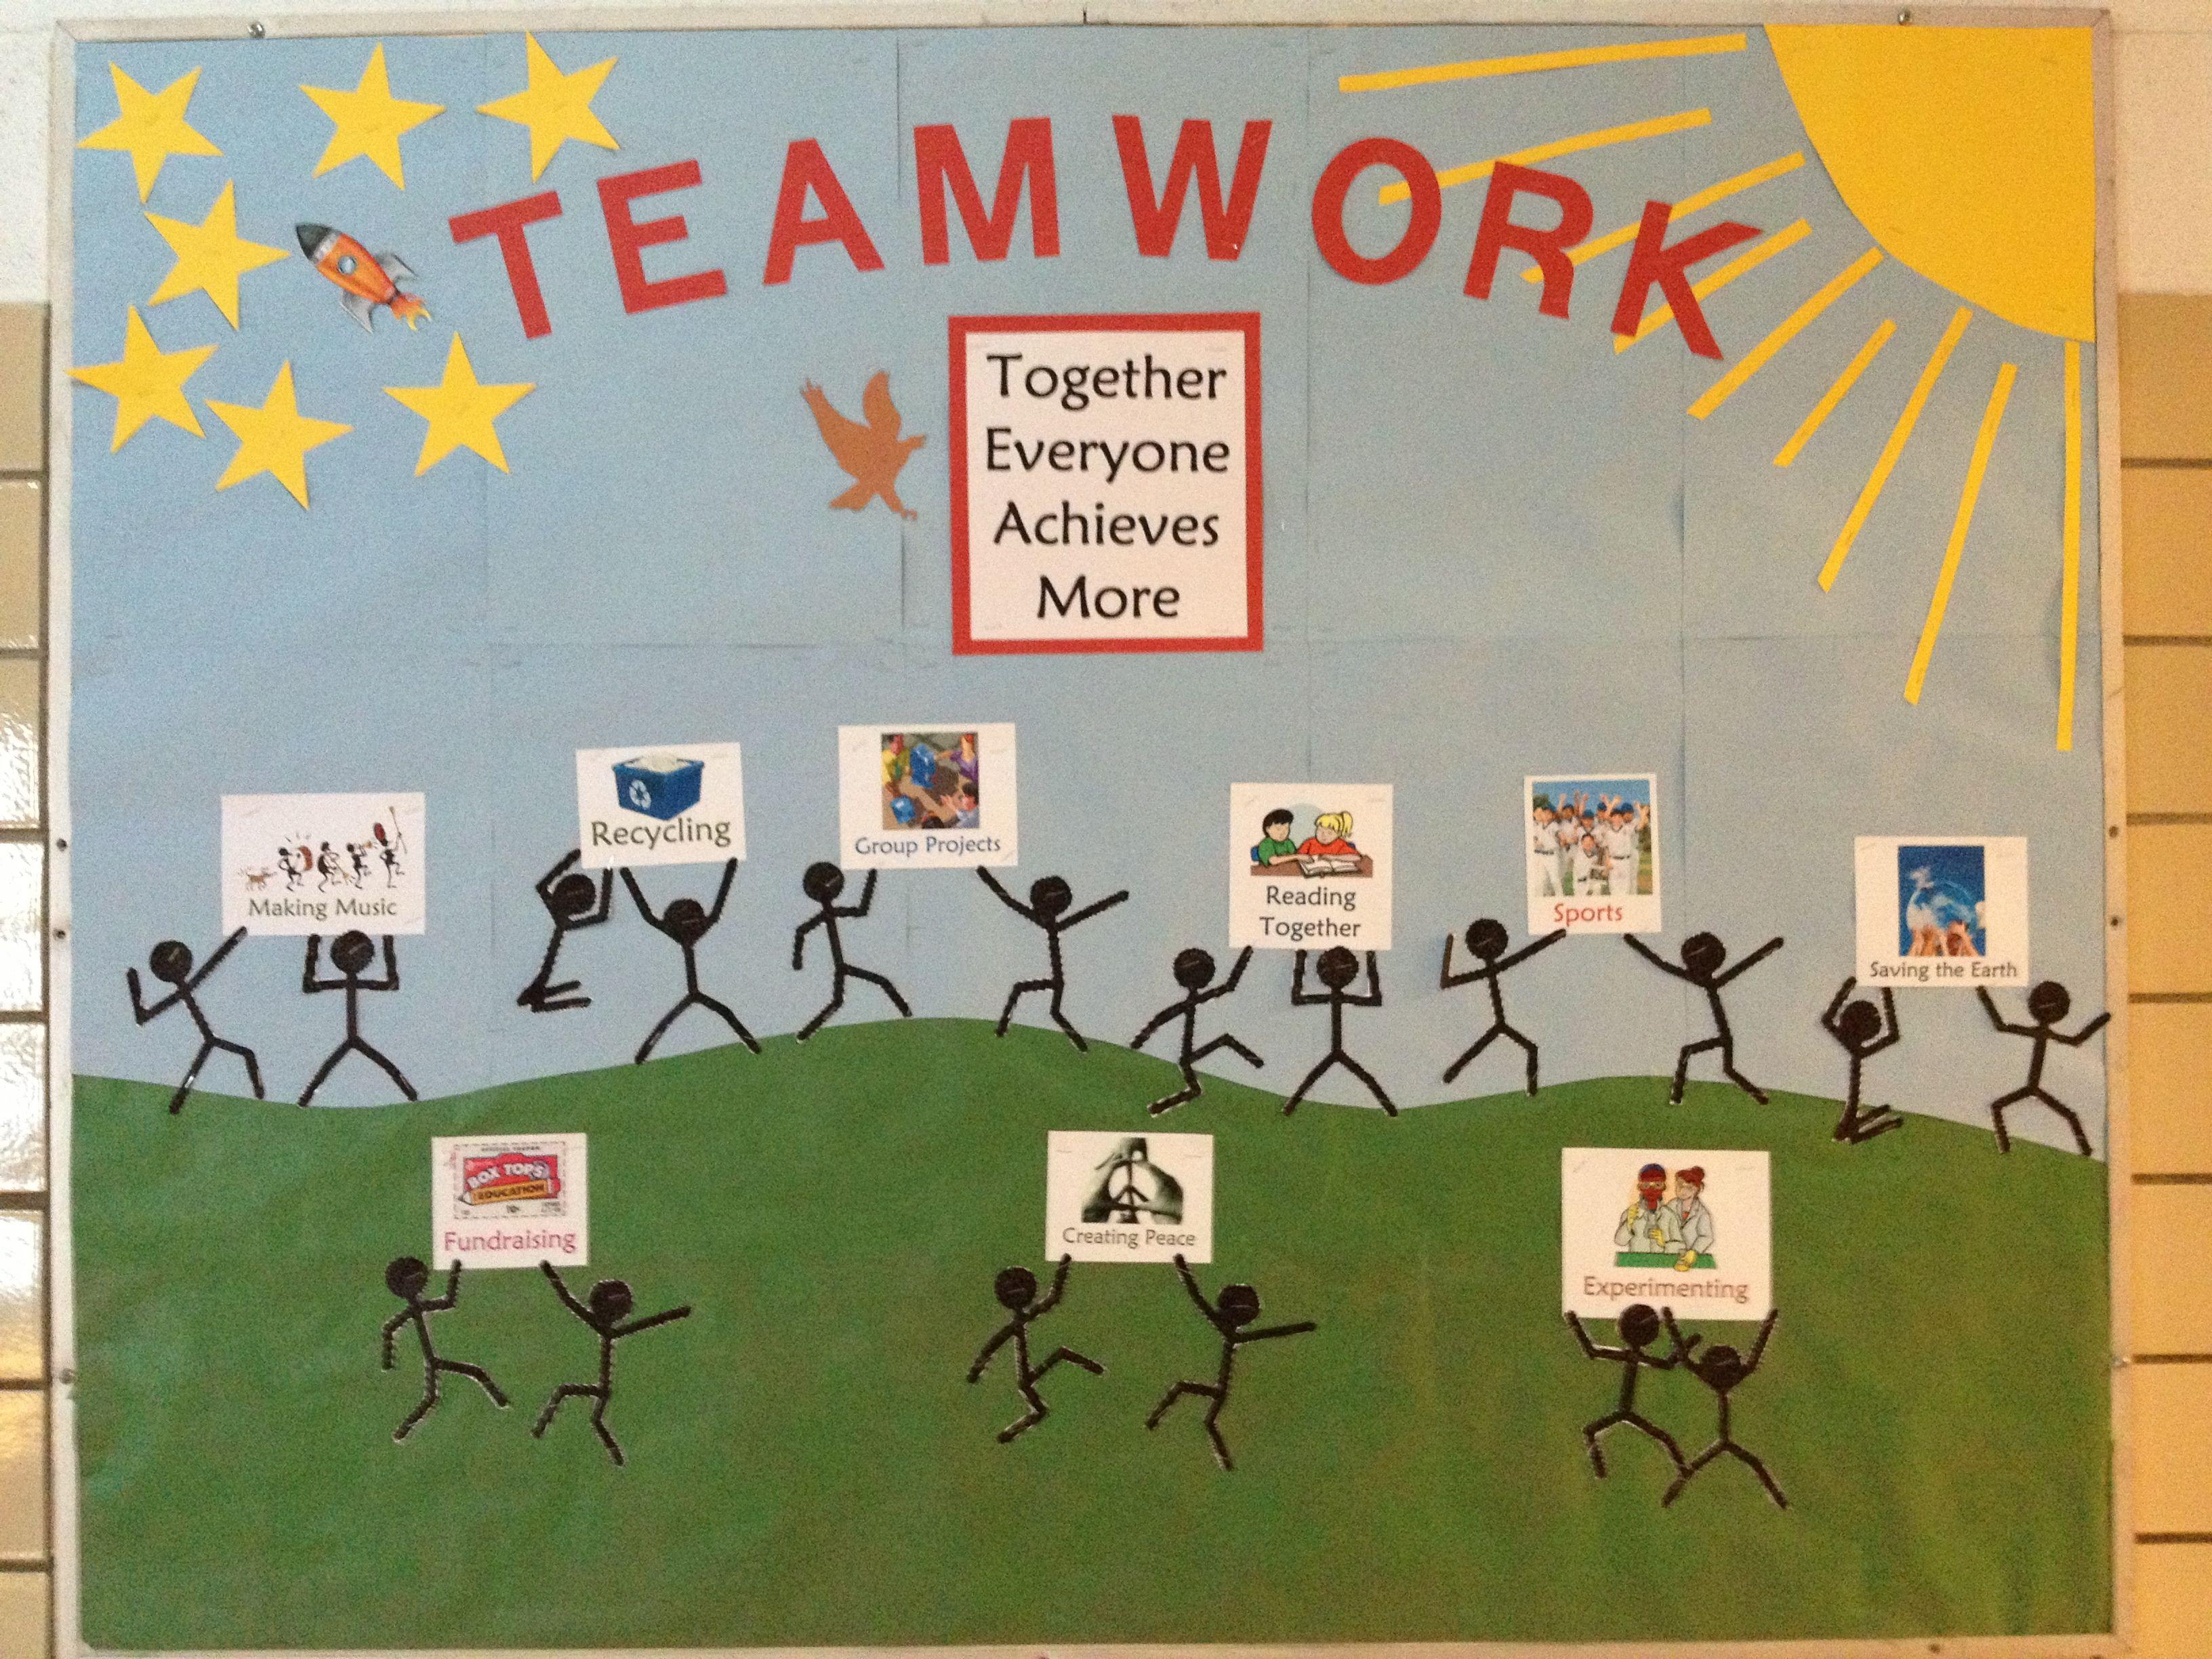 bulletin board ideas for office. teamwork bulletin board ideas for office